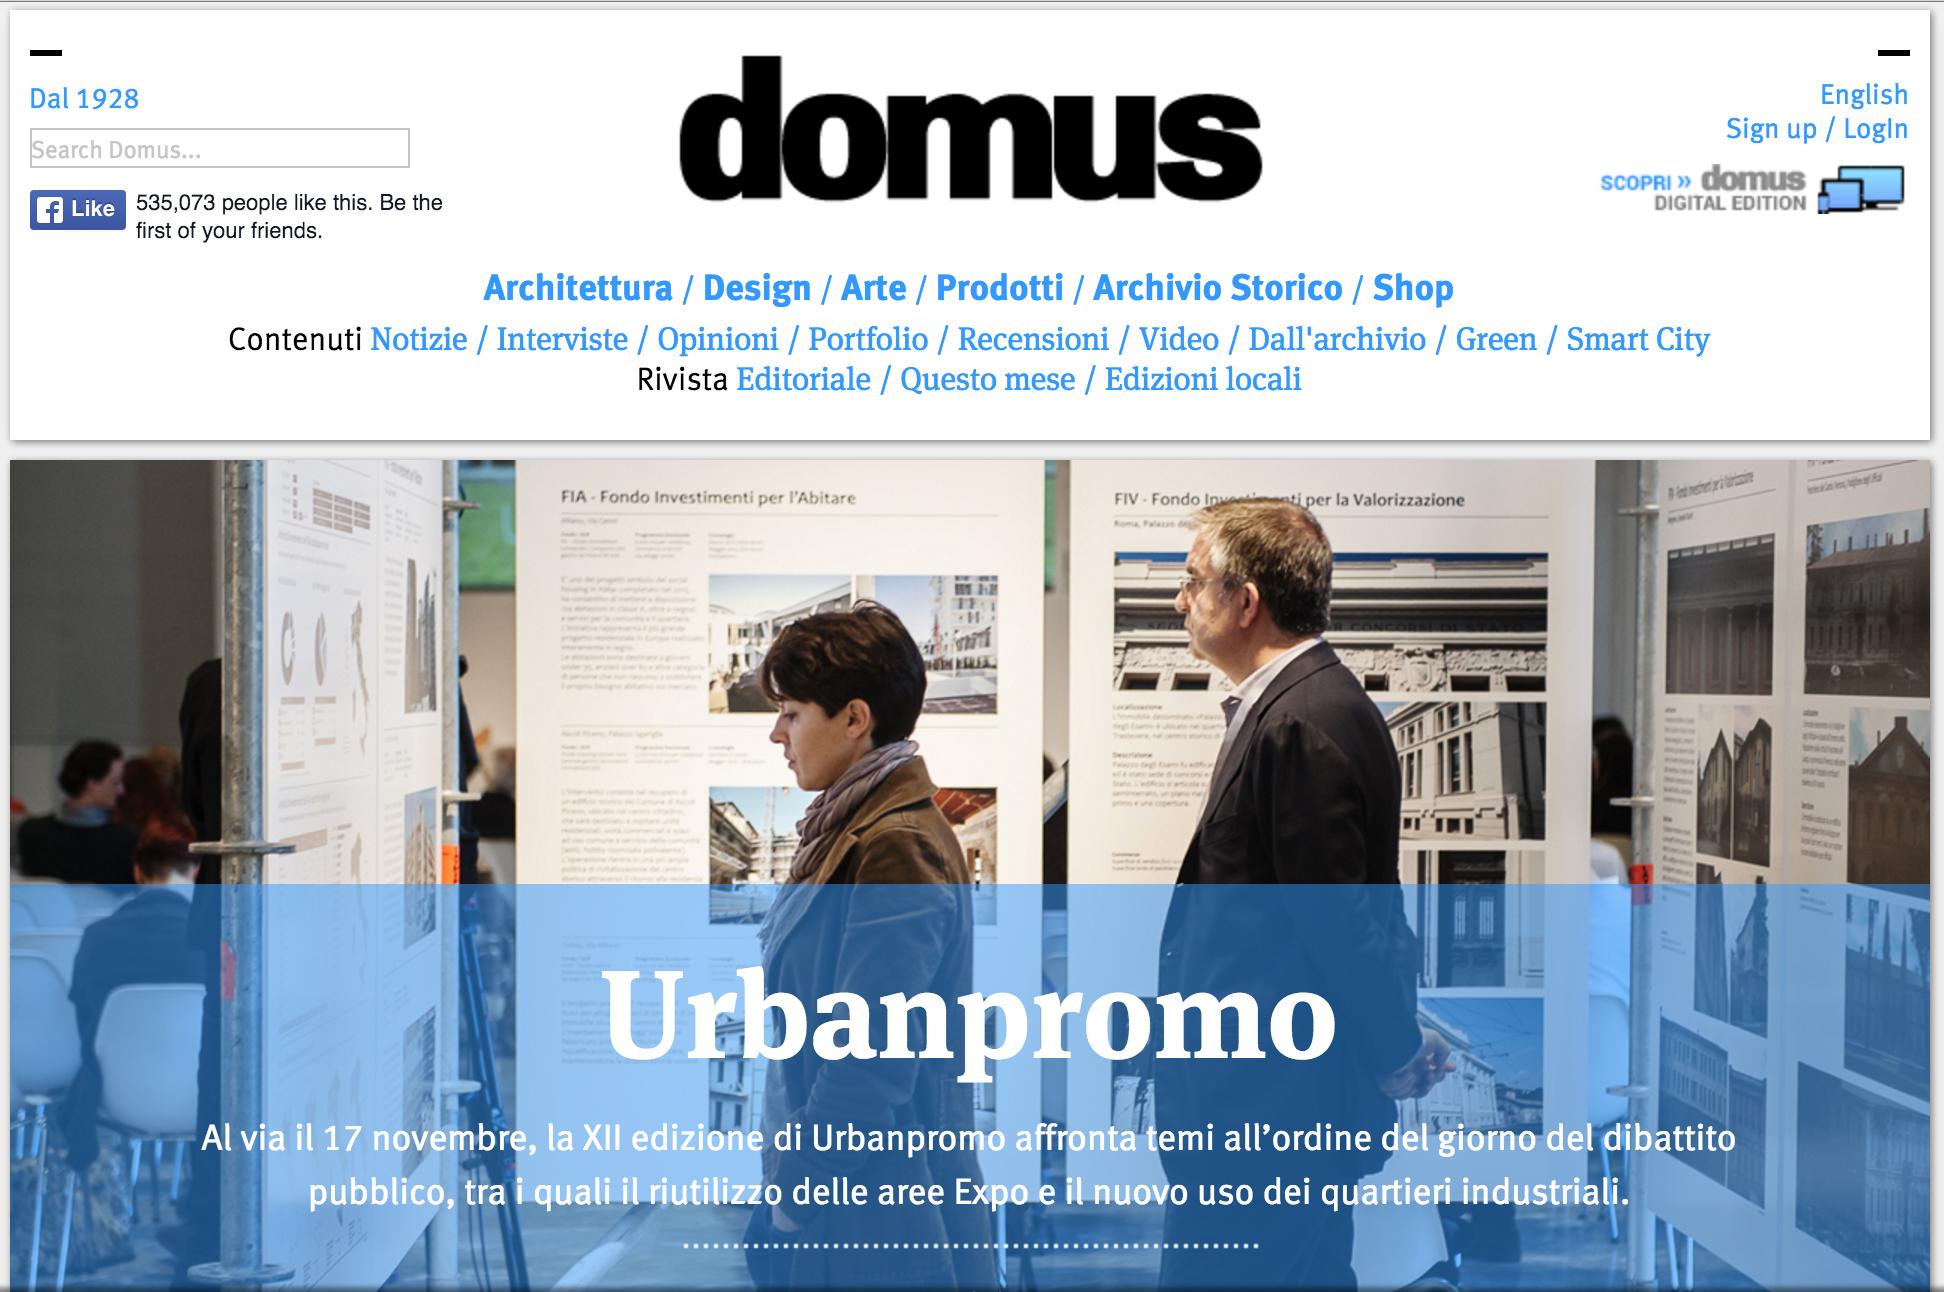 Domus' homepage